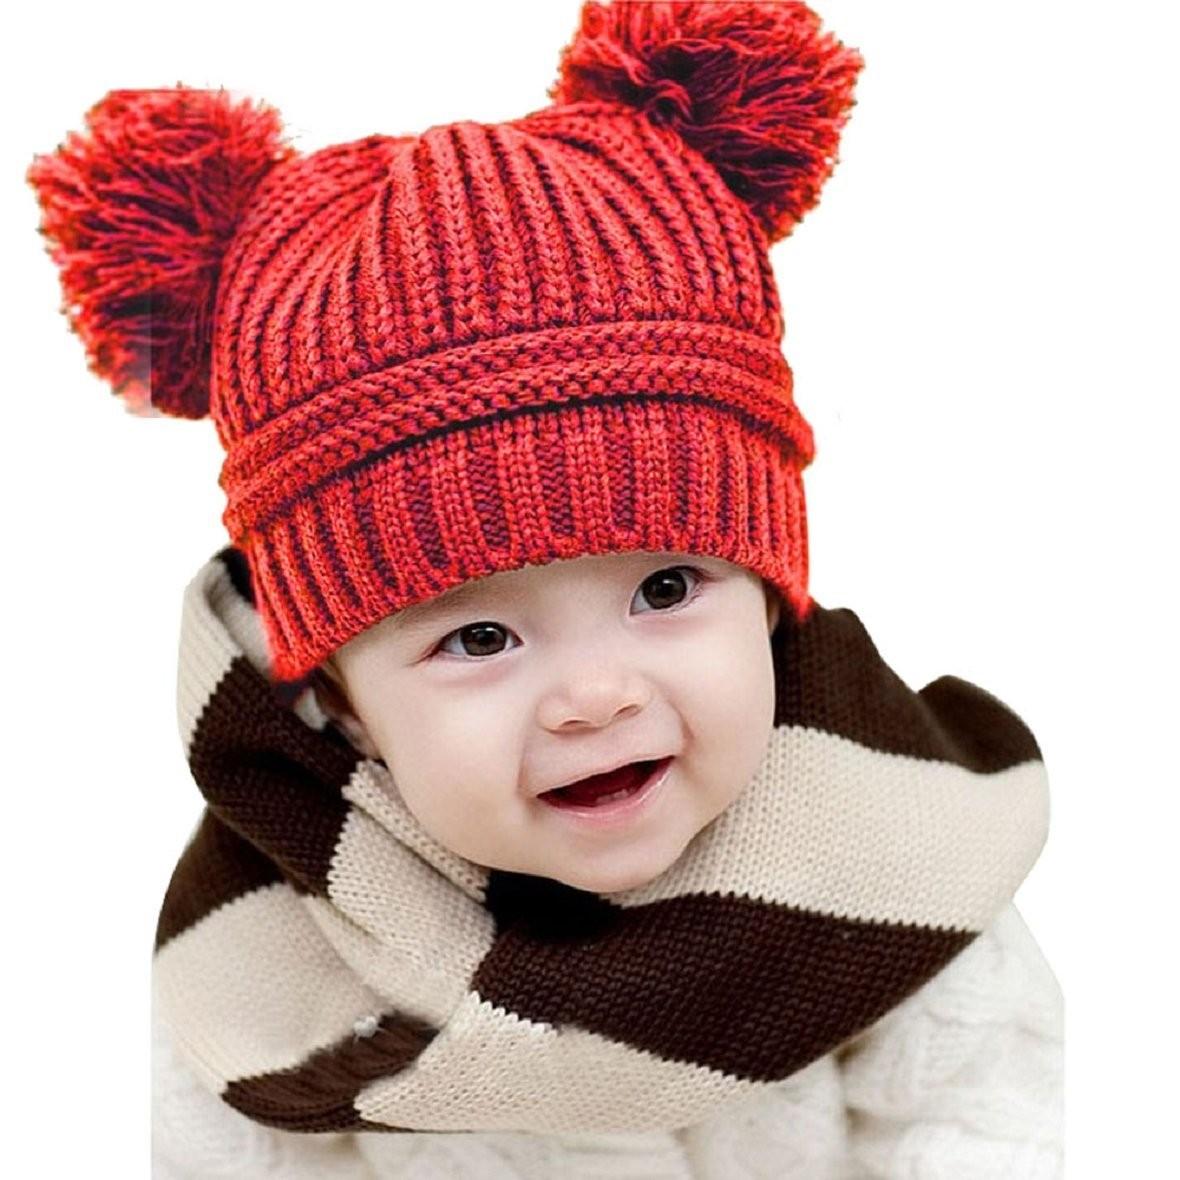 Baby Kids Girls Boys Dual Balls Warm Winter Knitted Caps Hats Beanie 2015 Cute